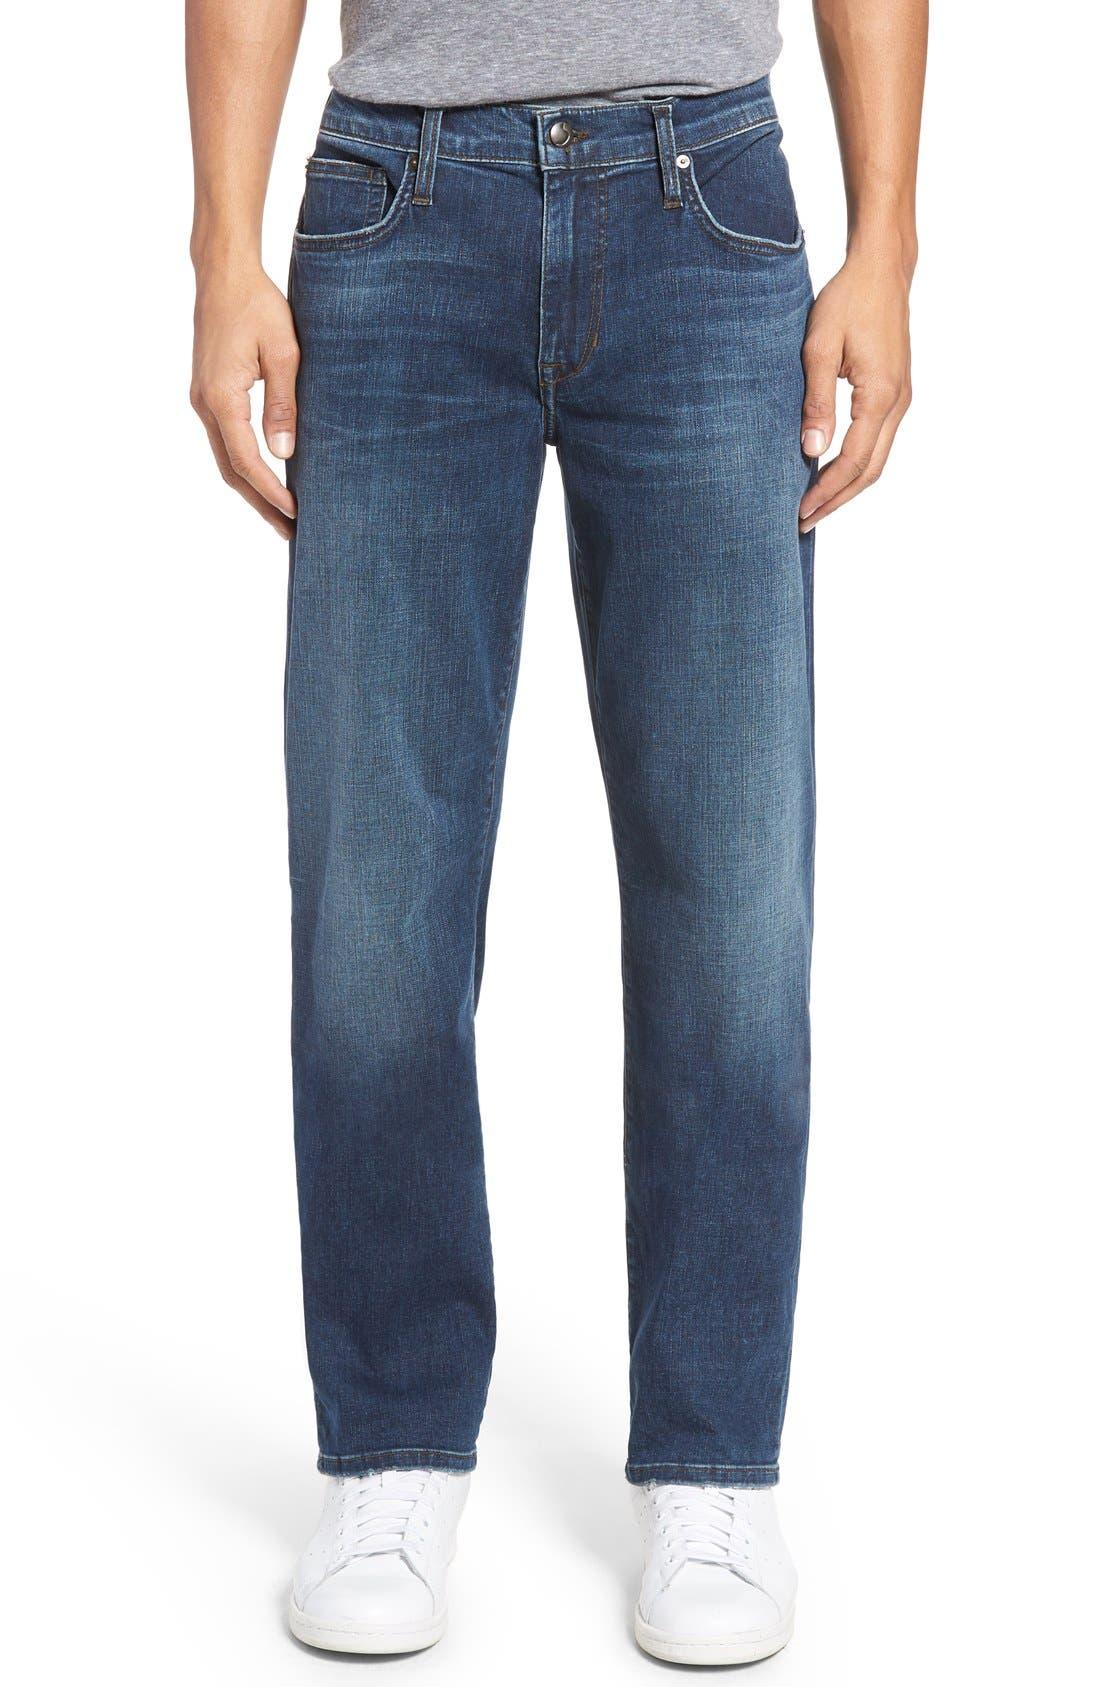 Brixton Slim Fit Jeans,                             Main thumbnail 1, color,                             Gladwin